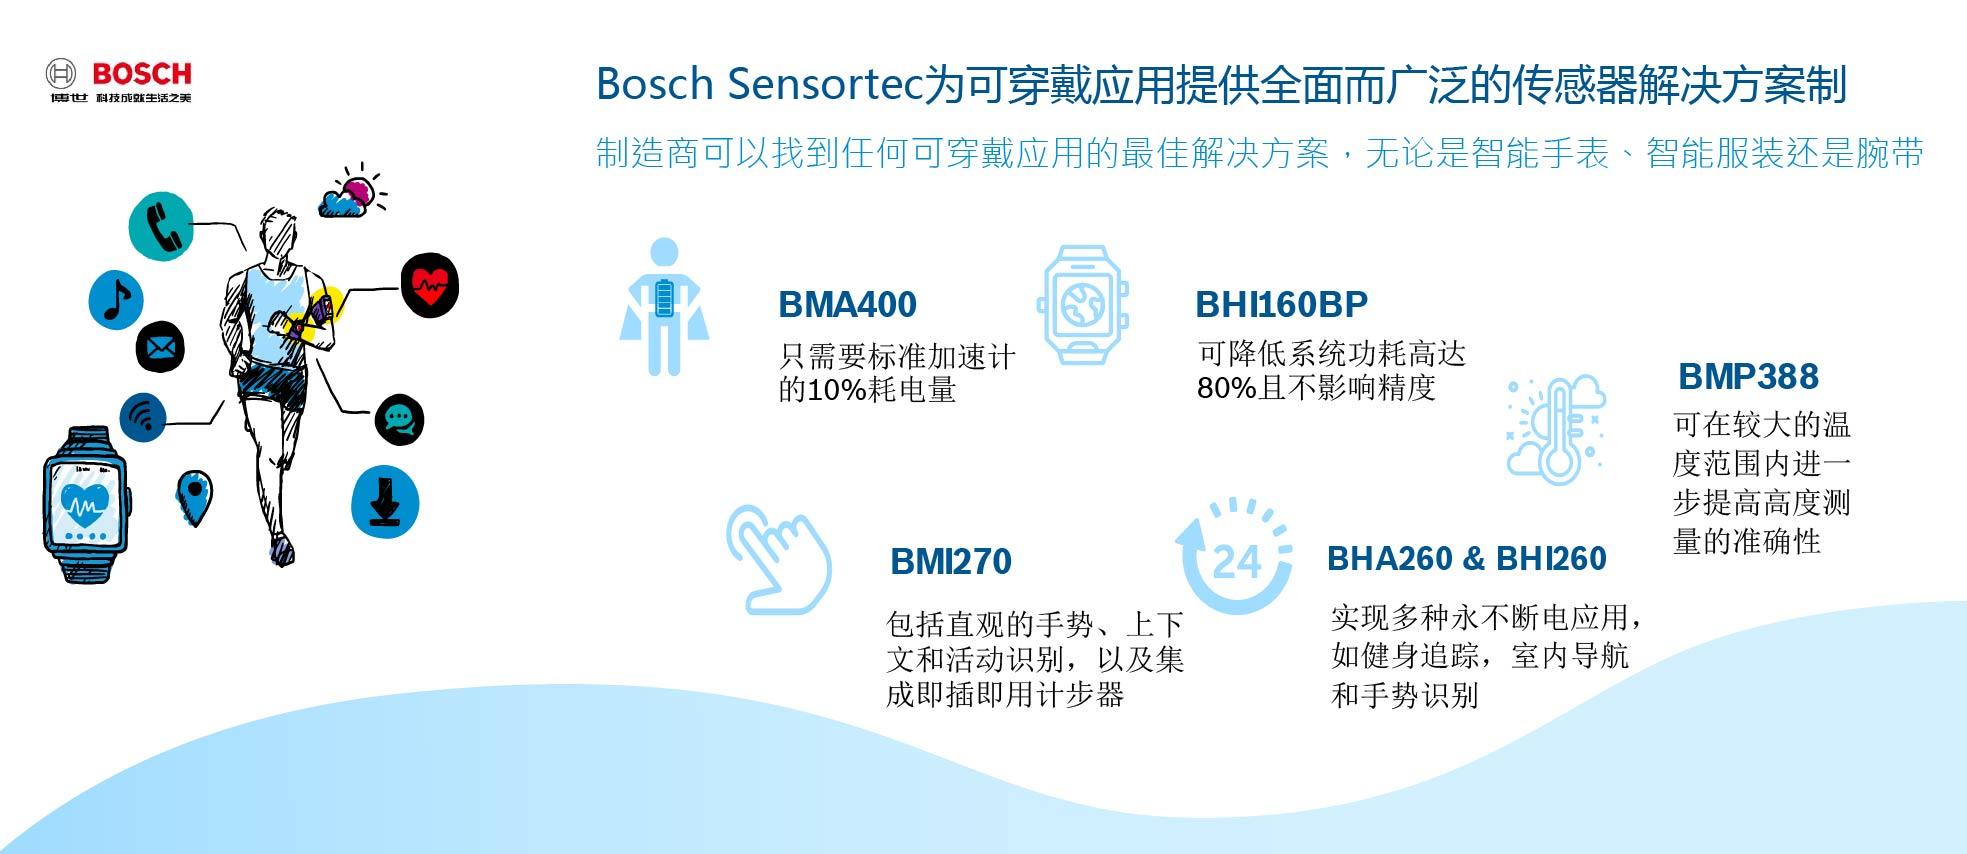 Bosch Sensortec 1